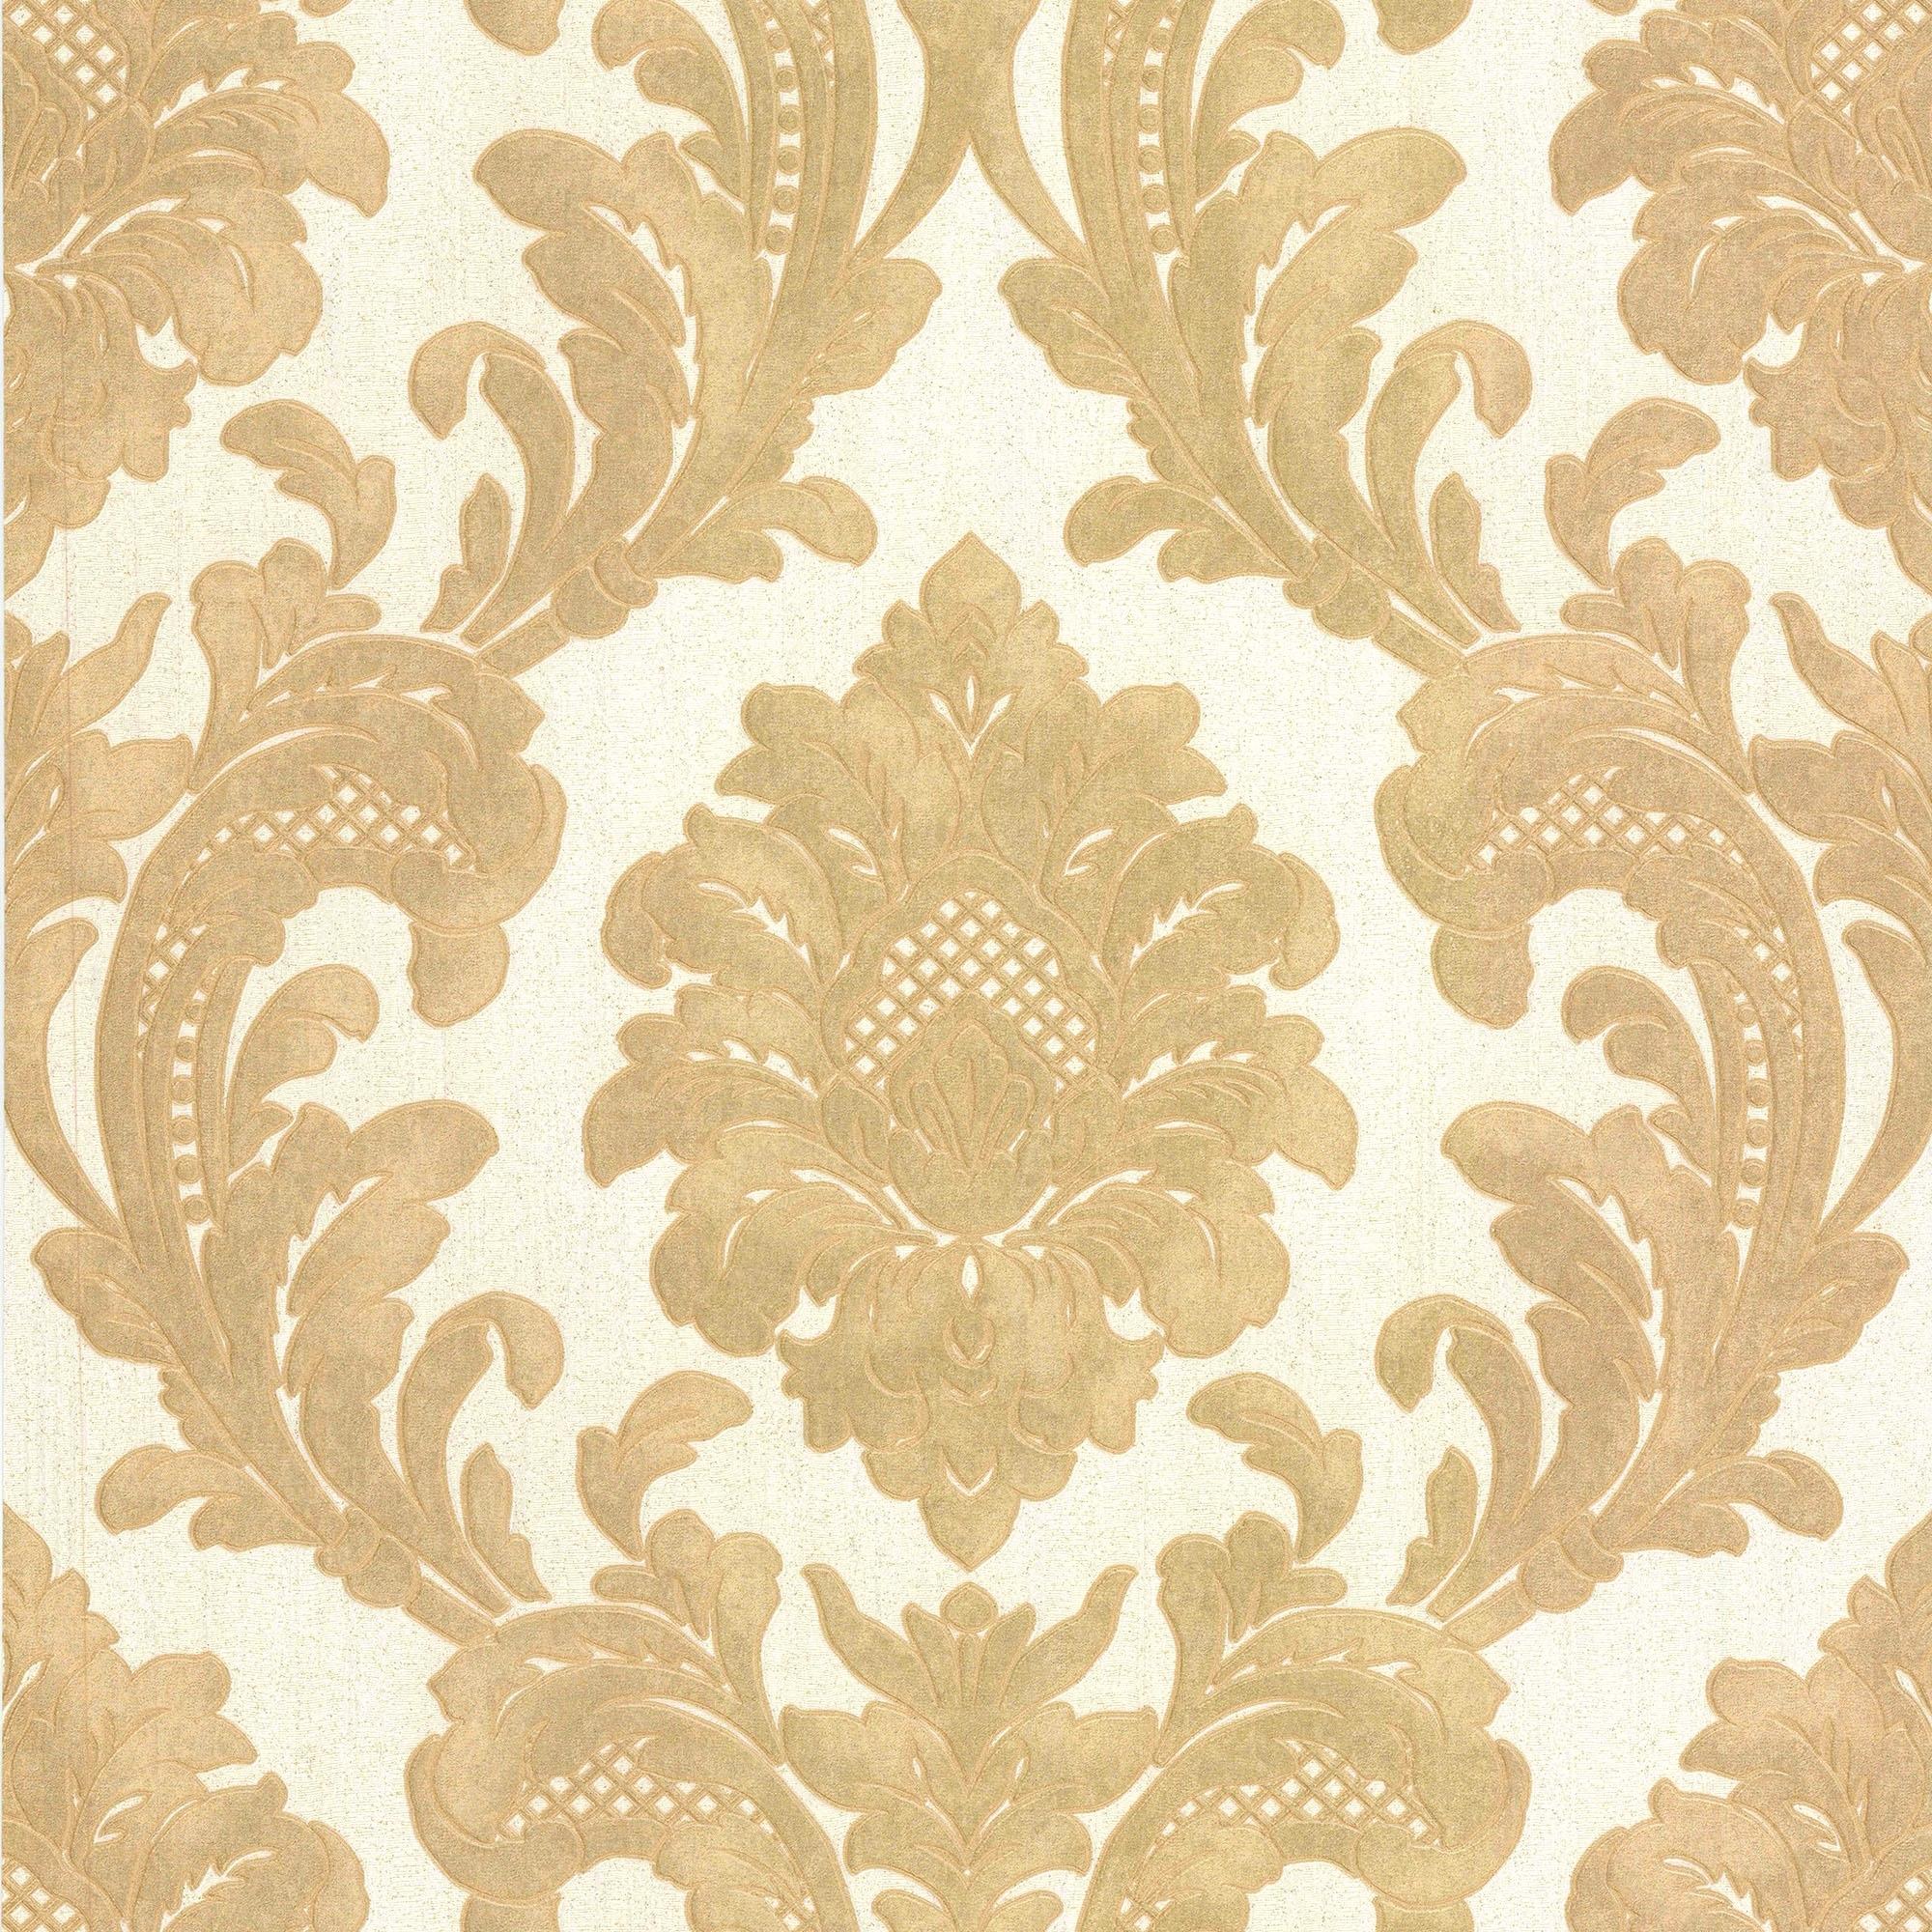 Milano 7 Damask Wallpaper Gold White M95588 Wallpaper From I